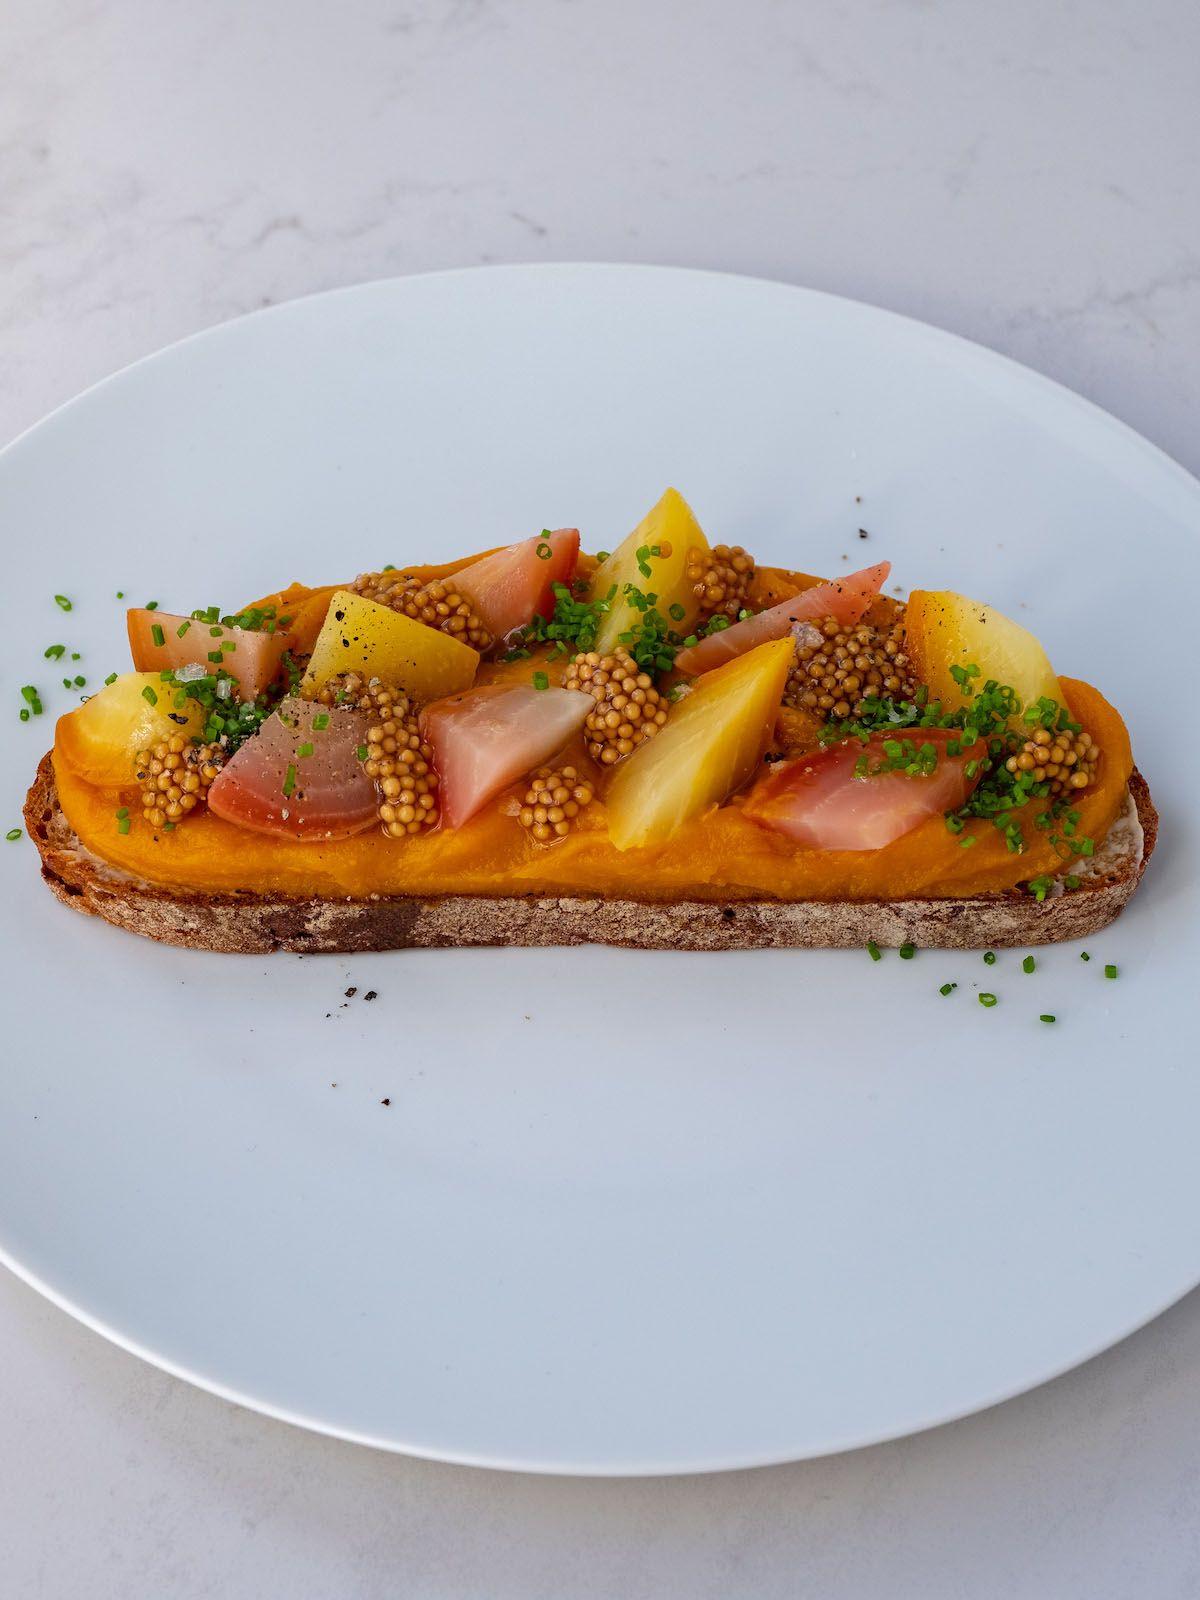 Foodblog, About Fuel, Rezept, Sandwich, Kürbis Zwiebel Marmelade, Brot, Stulle, Pfeffer, Senfcaviar, Aufstrich